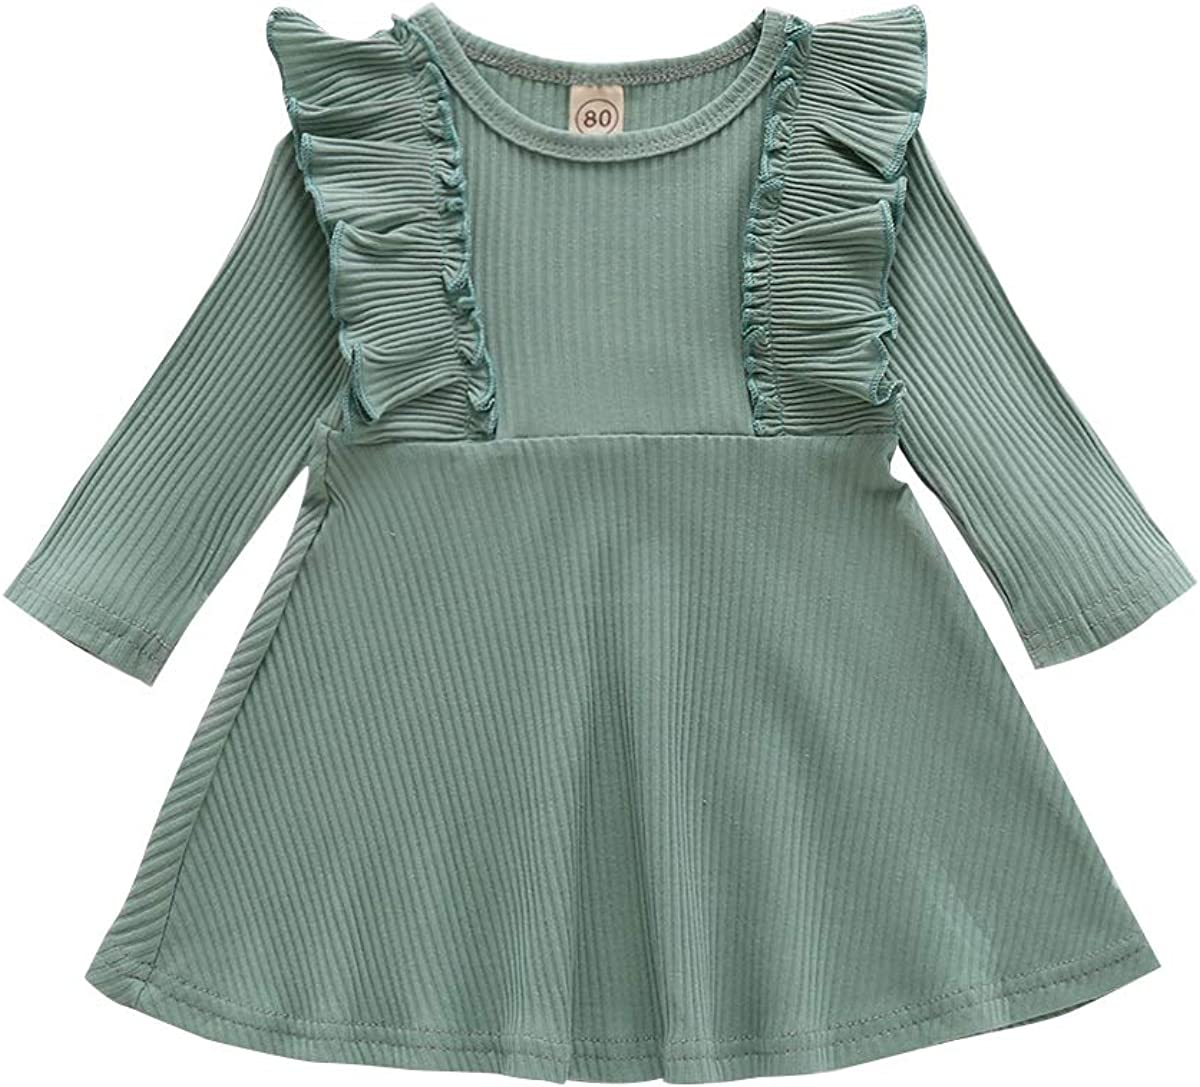 Ritatte Overseas parallel import regular item Toddler Baby Girl Dress Long Ribbed Save money Solid Ruffle Sleeve